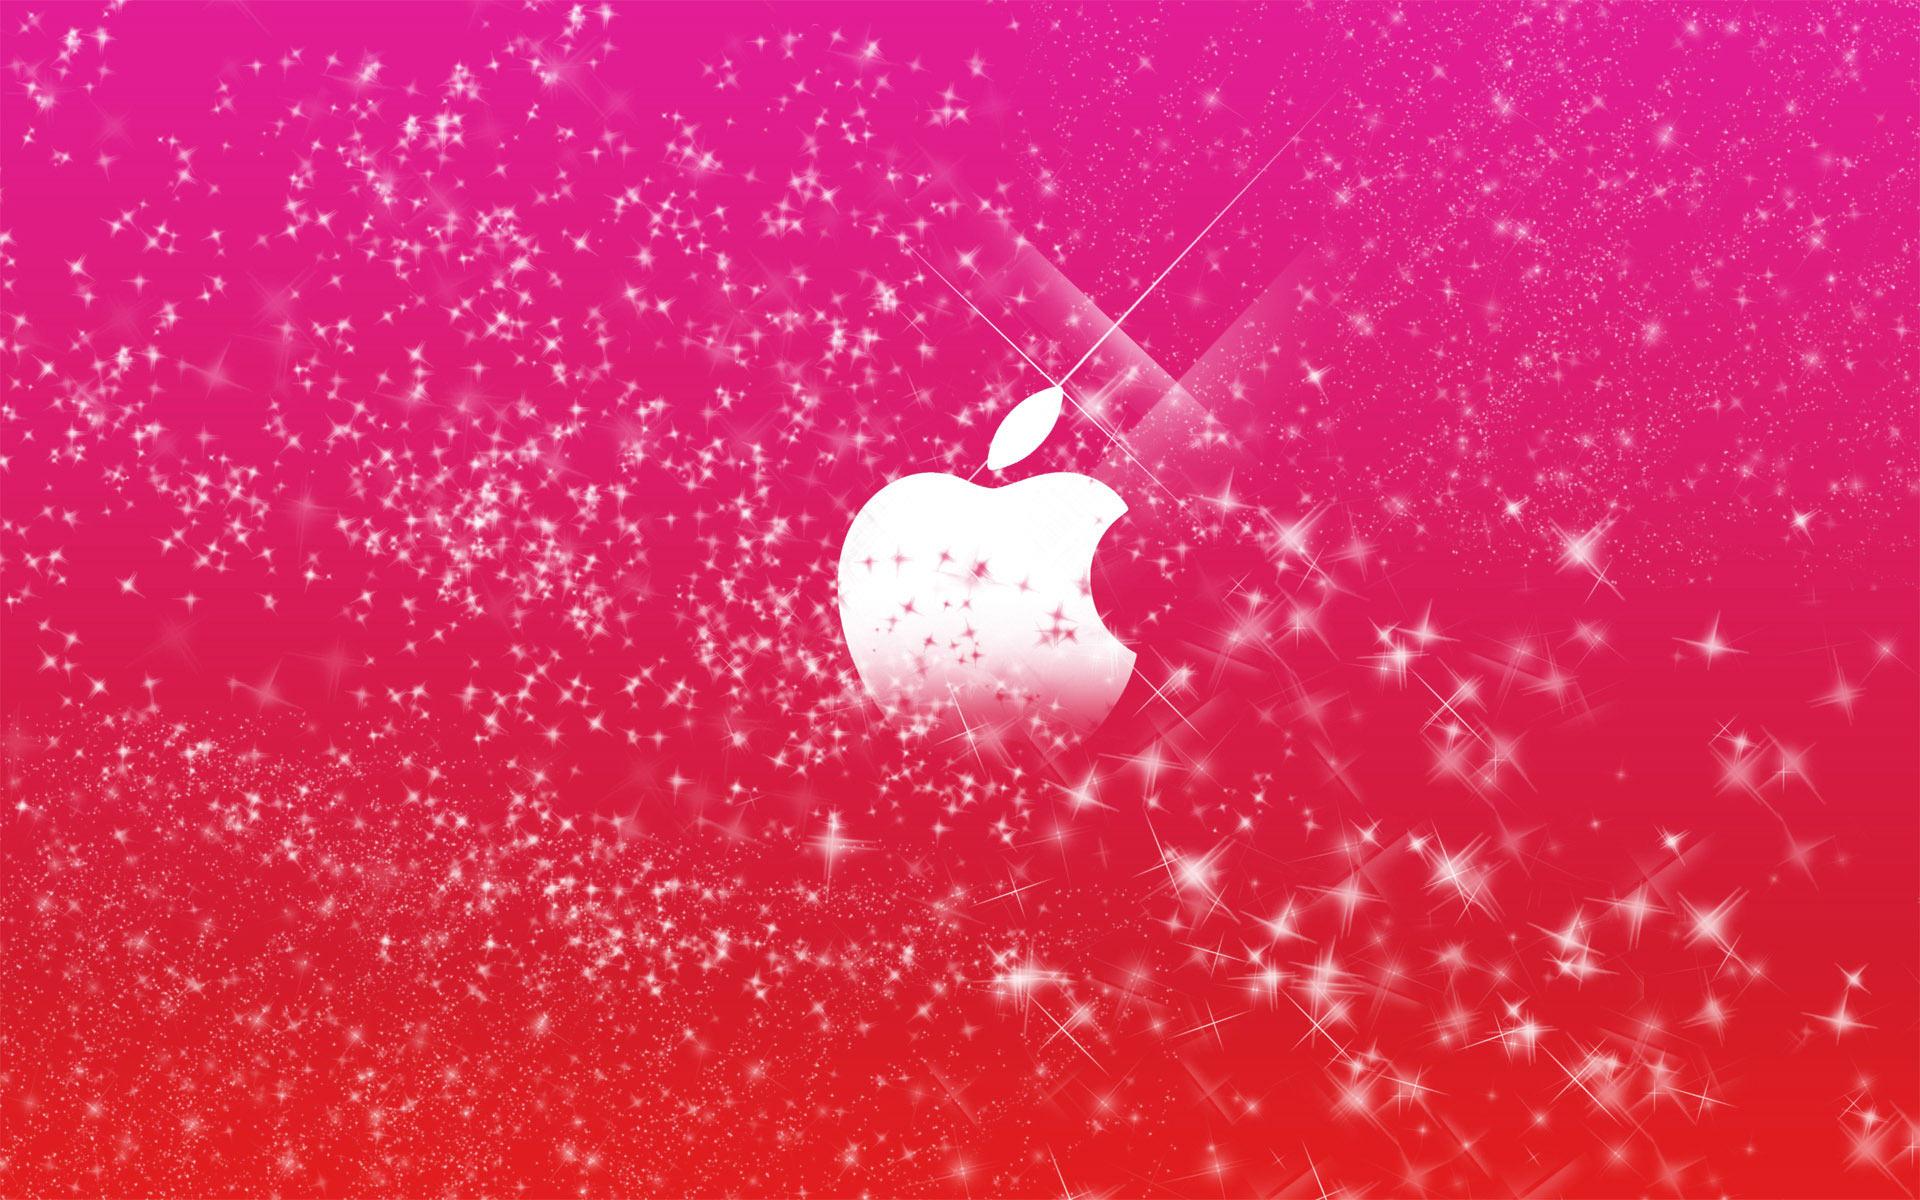 backgrounds pink desktop backgrounds Desktop Backgrounds 1920x1200